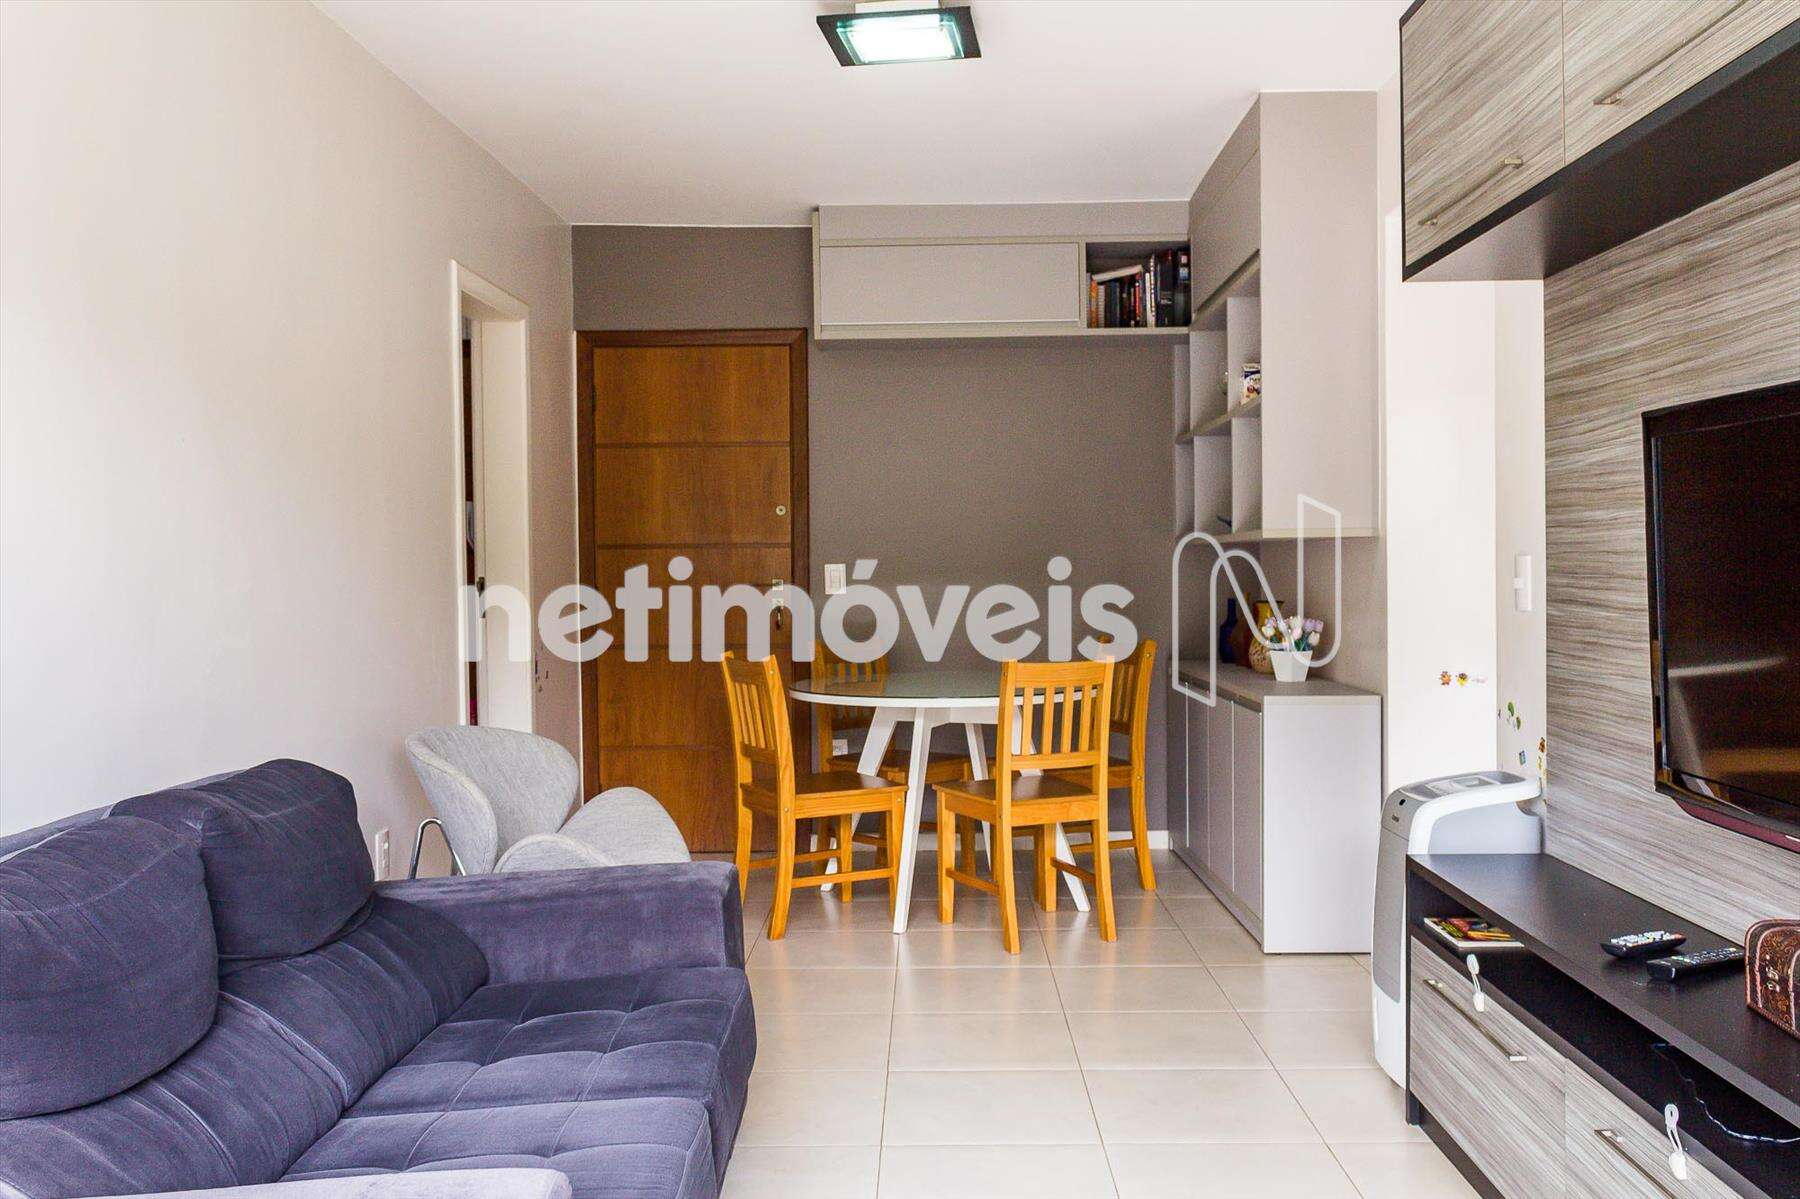 apartamento 2 quartos,distrito federal,asa norte,brasília,unb,parque olhos d agua,ceub,noroeste,iguatemi,